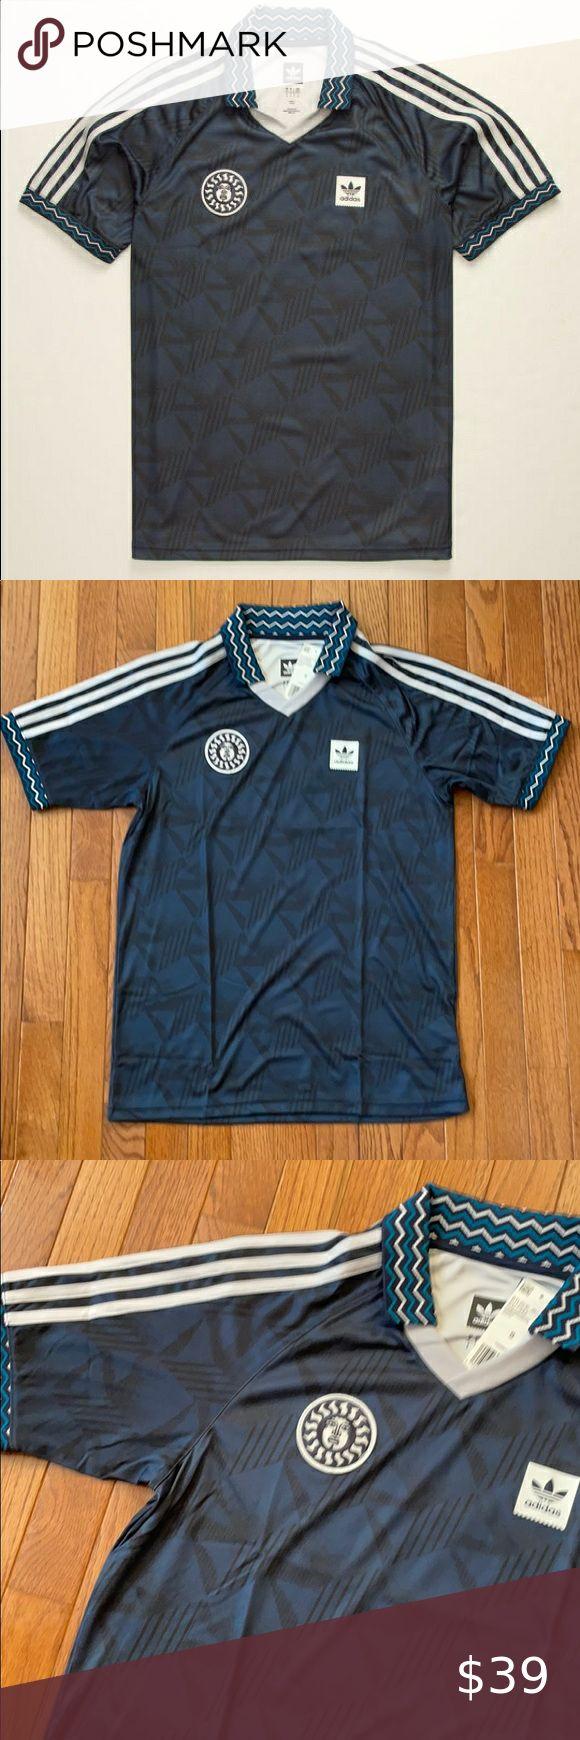 ADIDAS Bootleague Mens Jersey - Small | Blue adidas, Adidas, Fashion